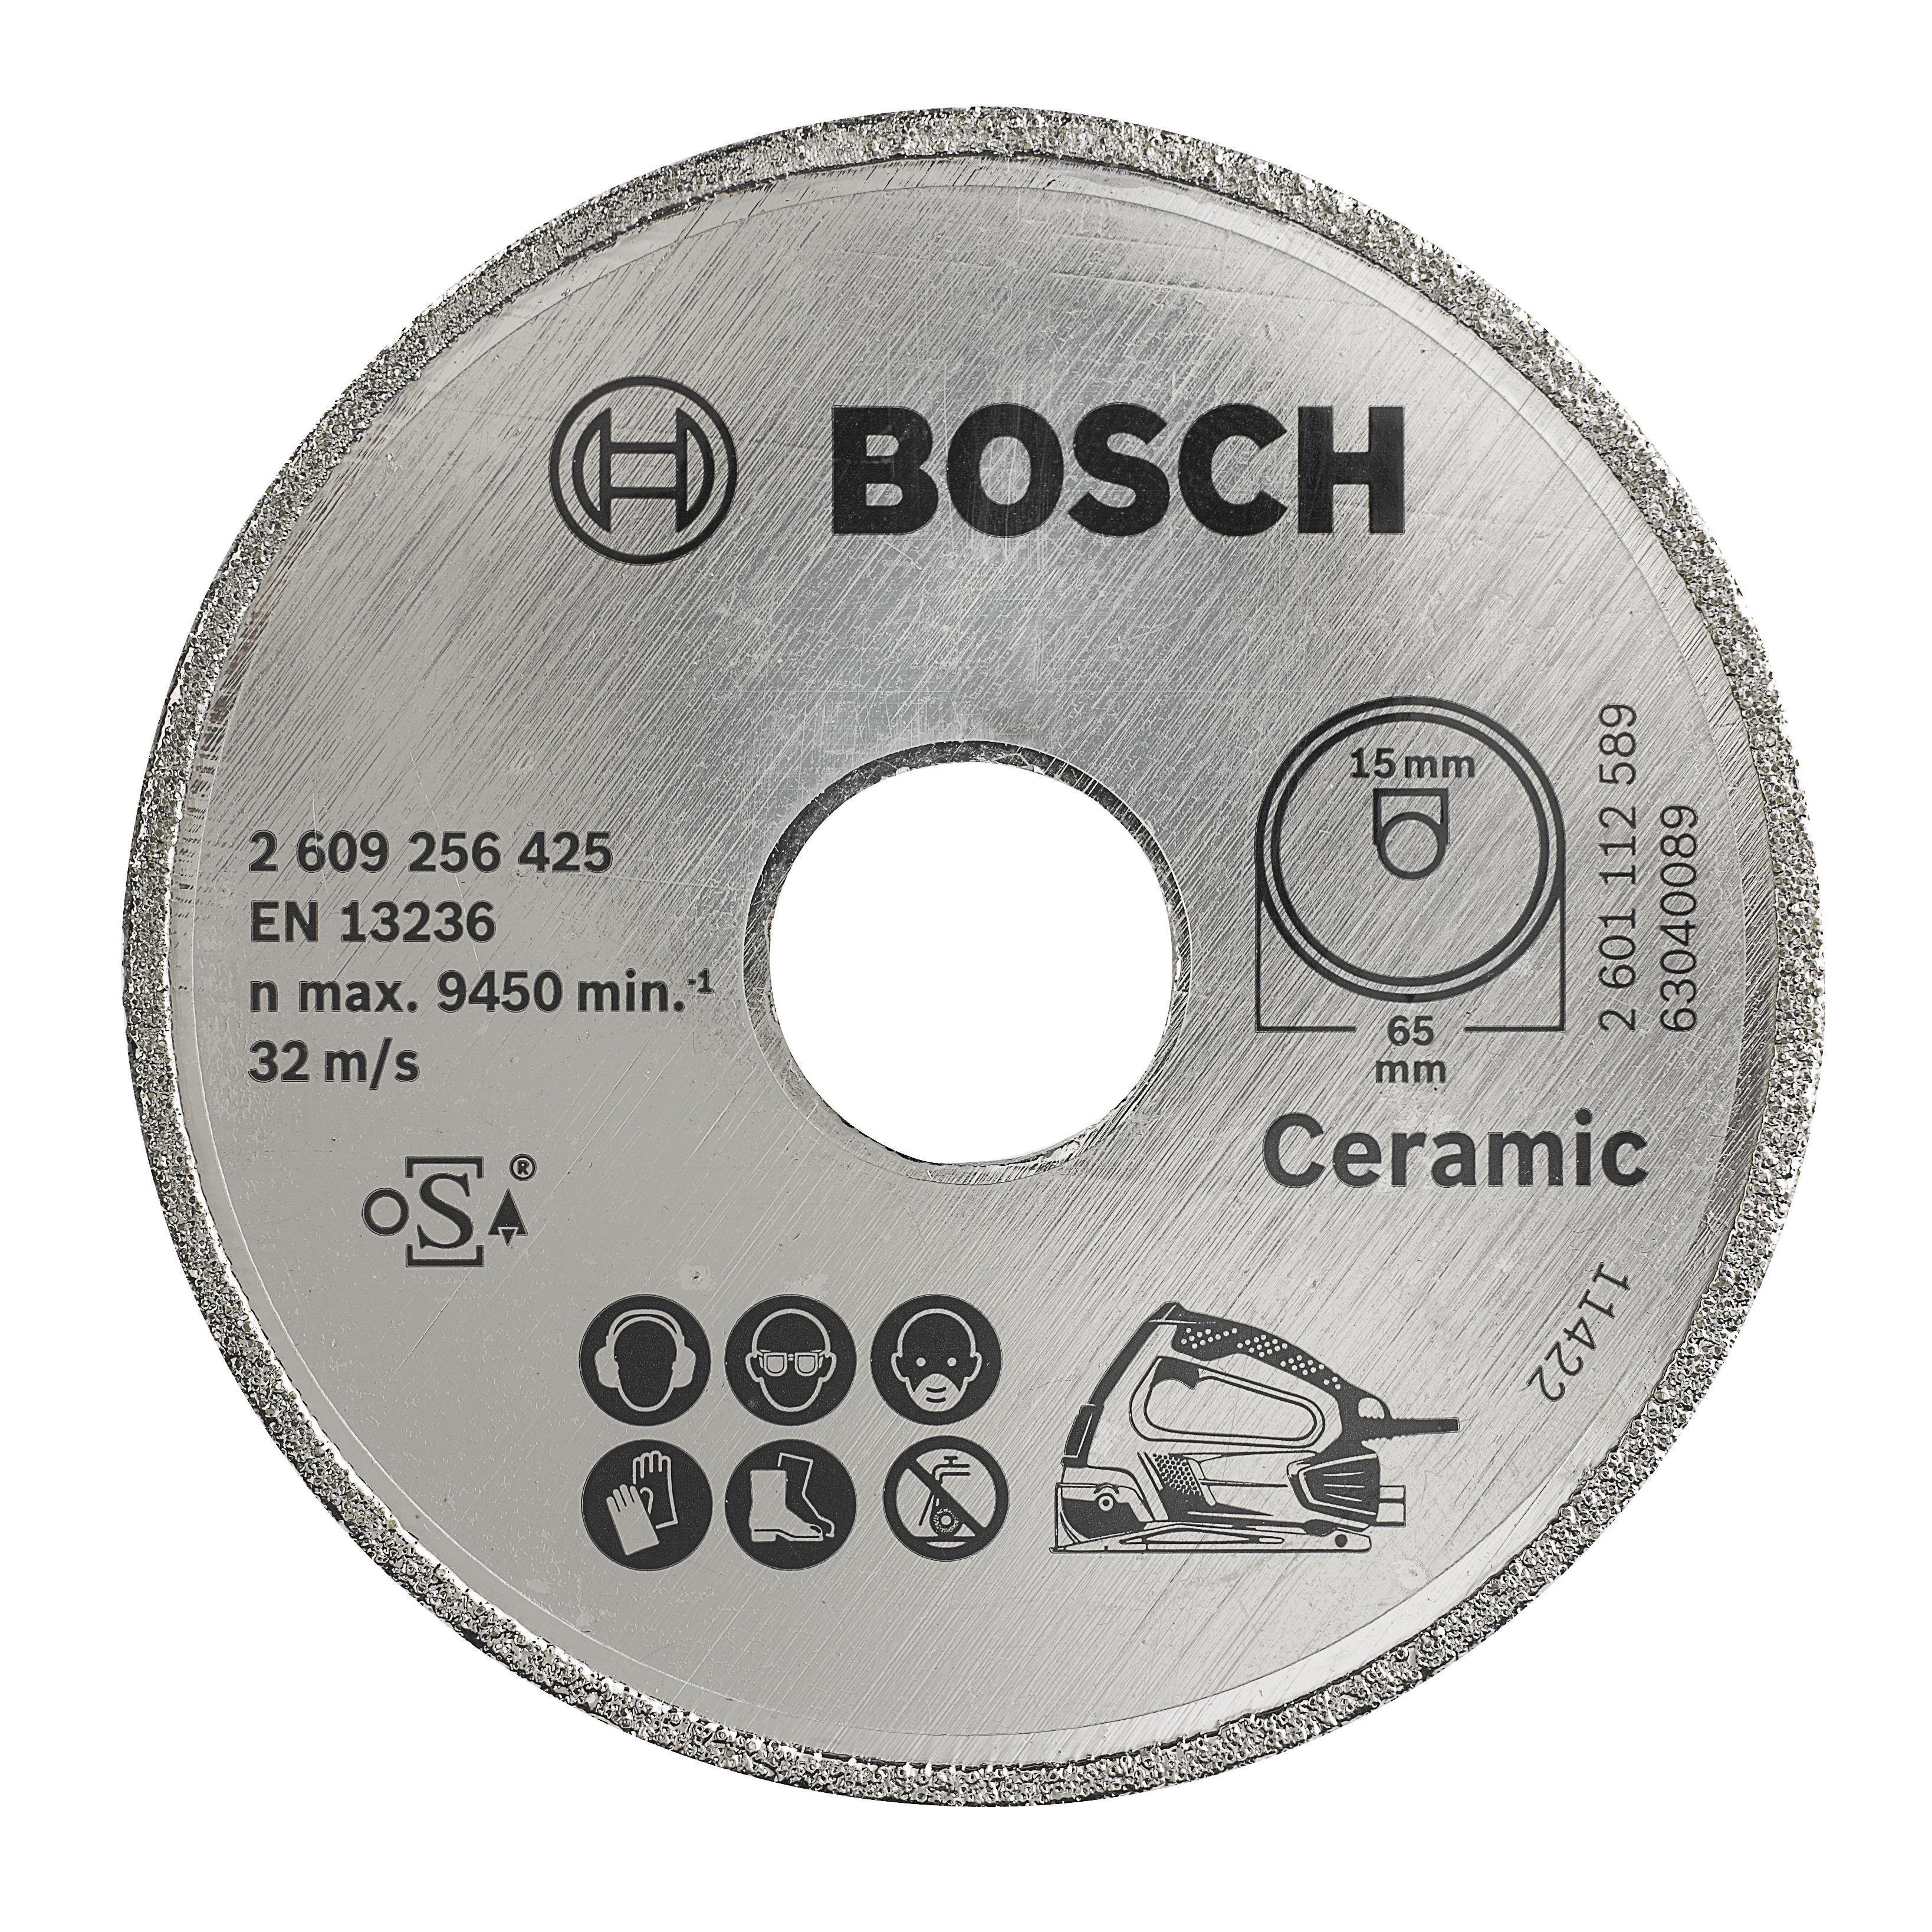 Bosch Diamond Cutting Blade (dia)65mm